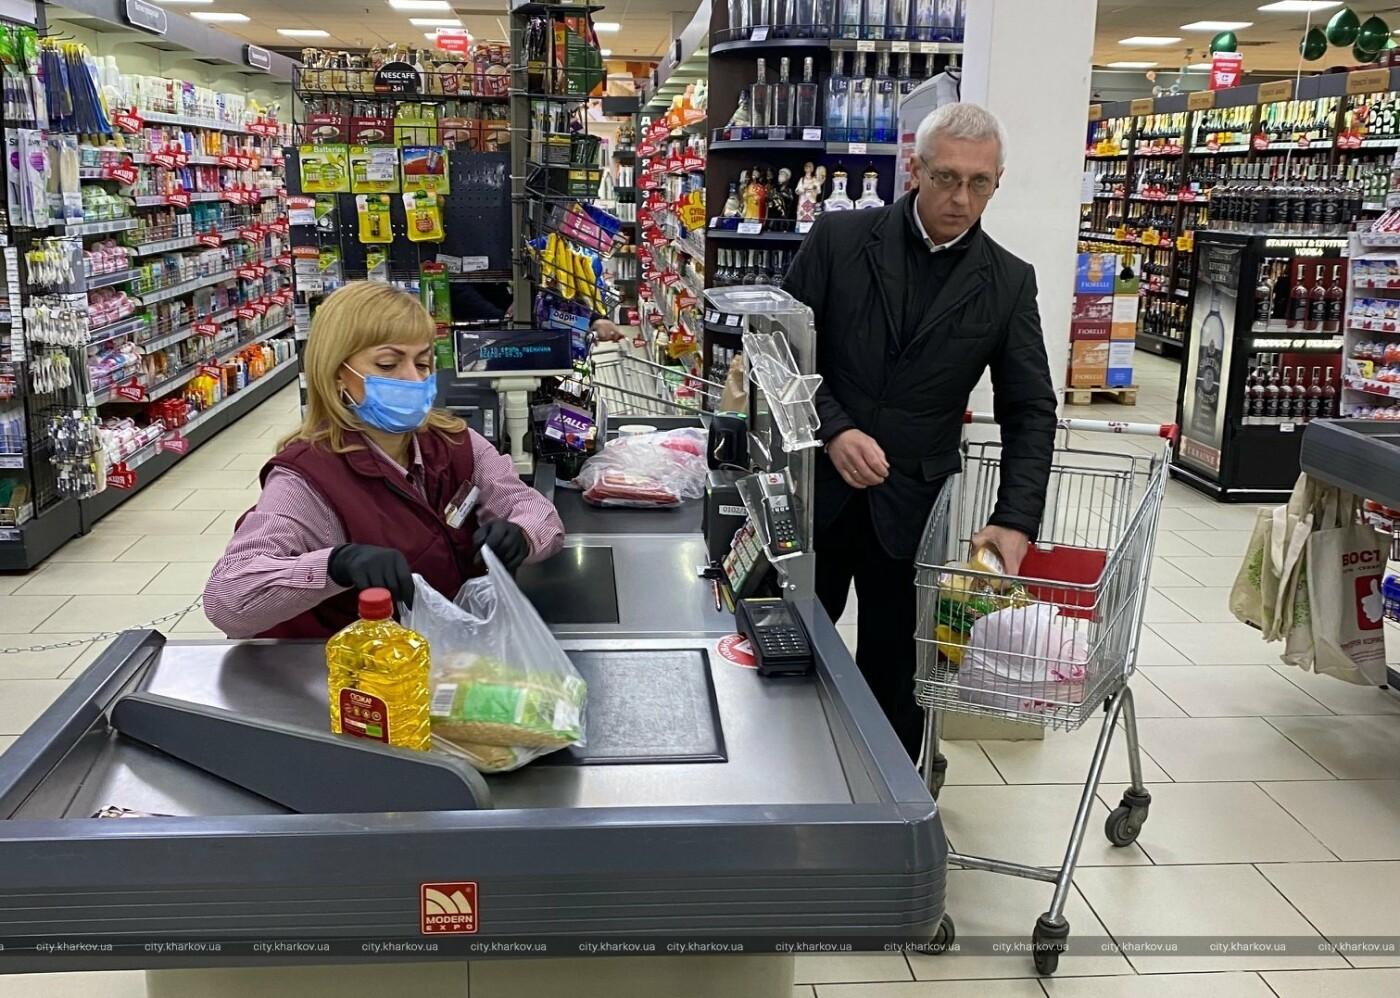 В Харькове проверили работу двух супермаркетов во время карантина, - ФОТО, фото-5